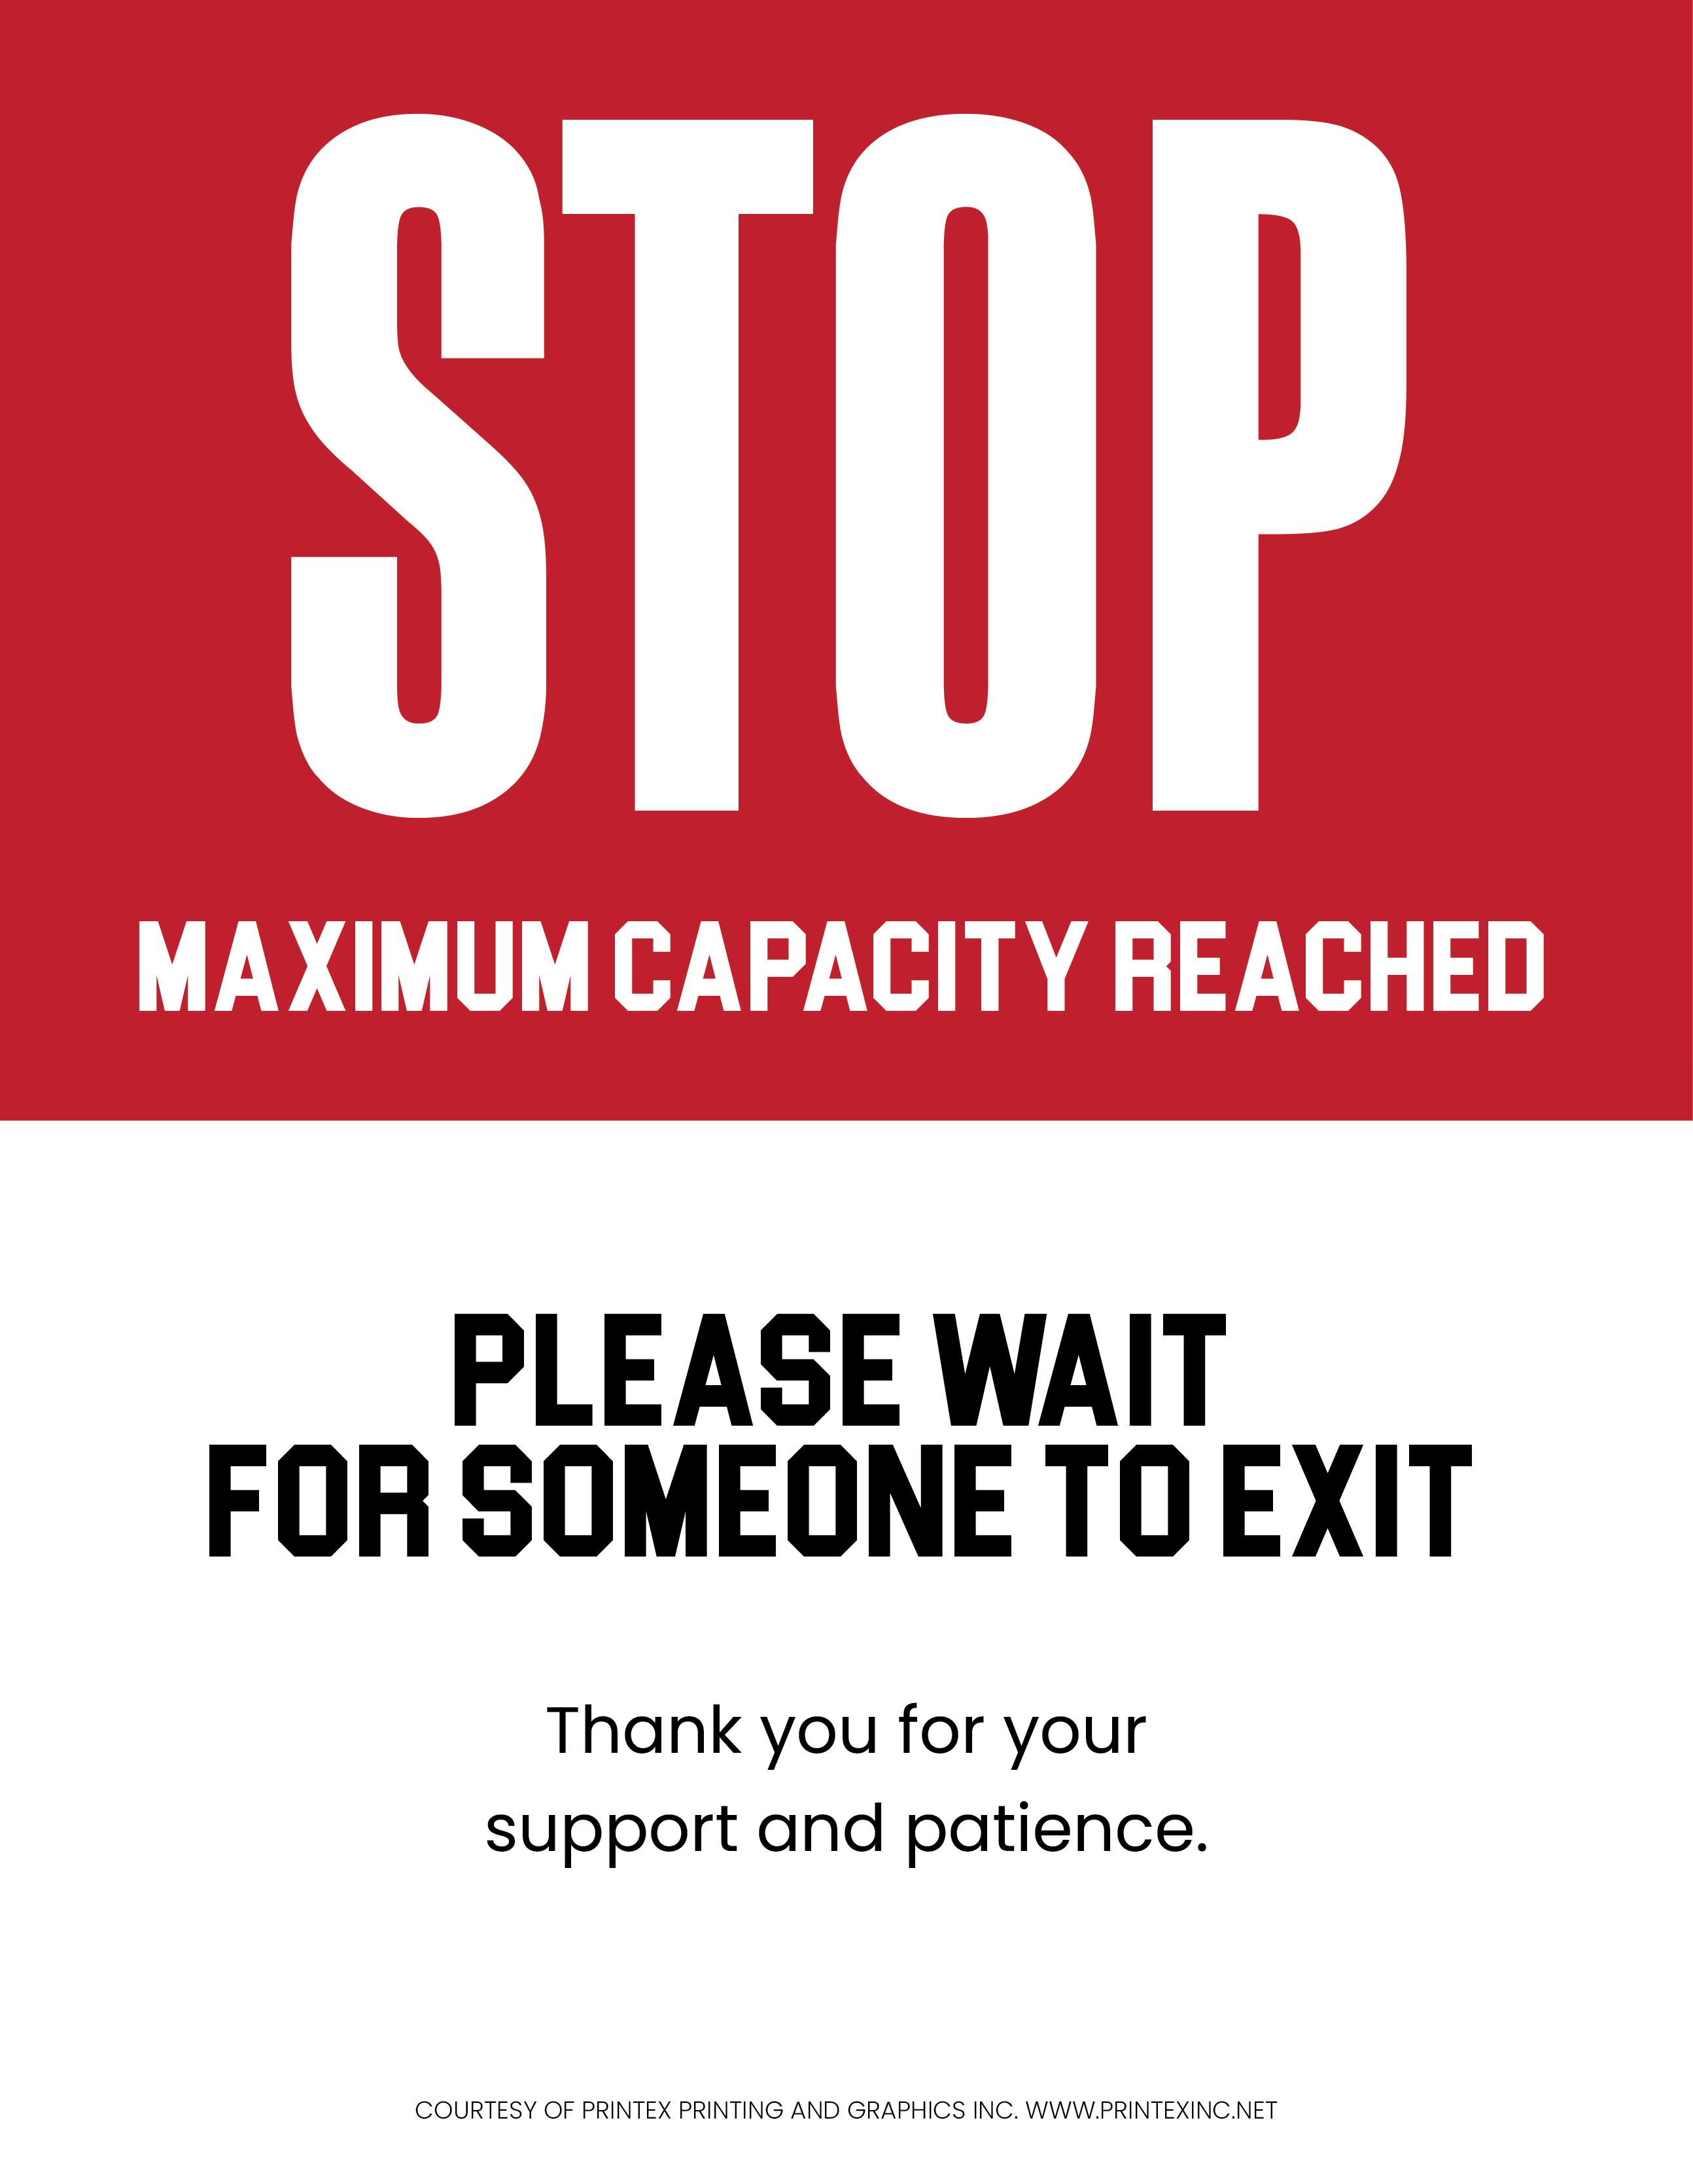 Stop Maximum Capacity Reached Sign